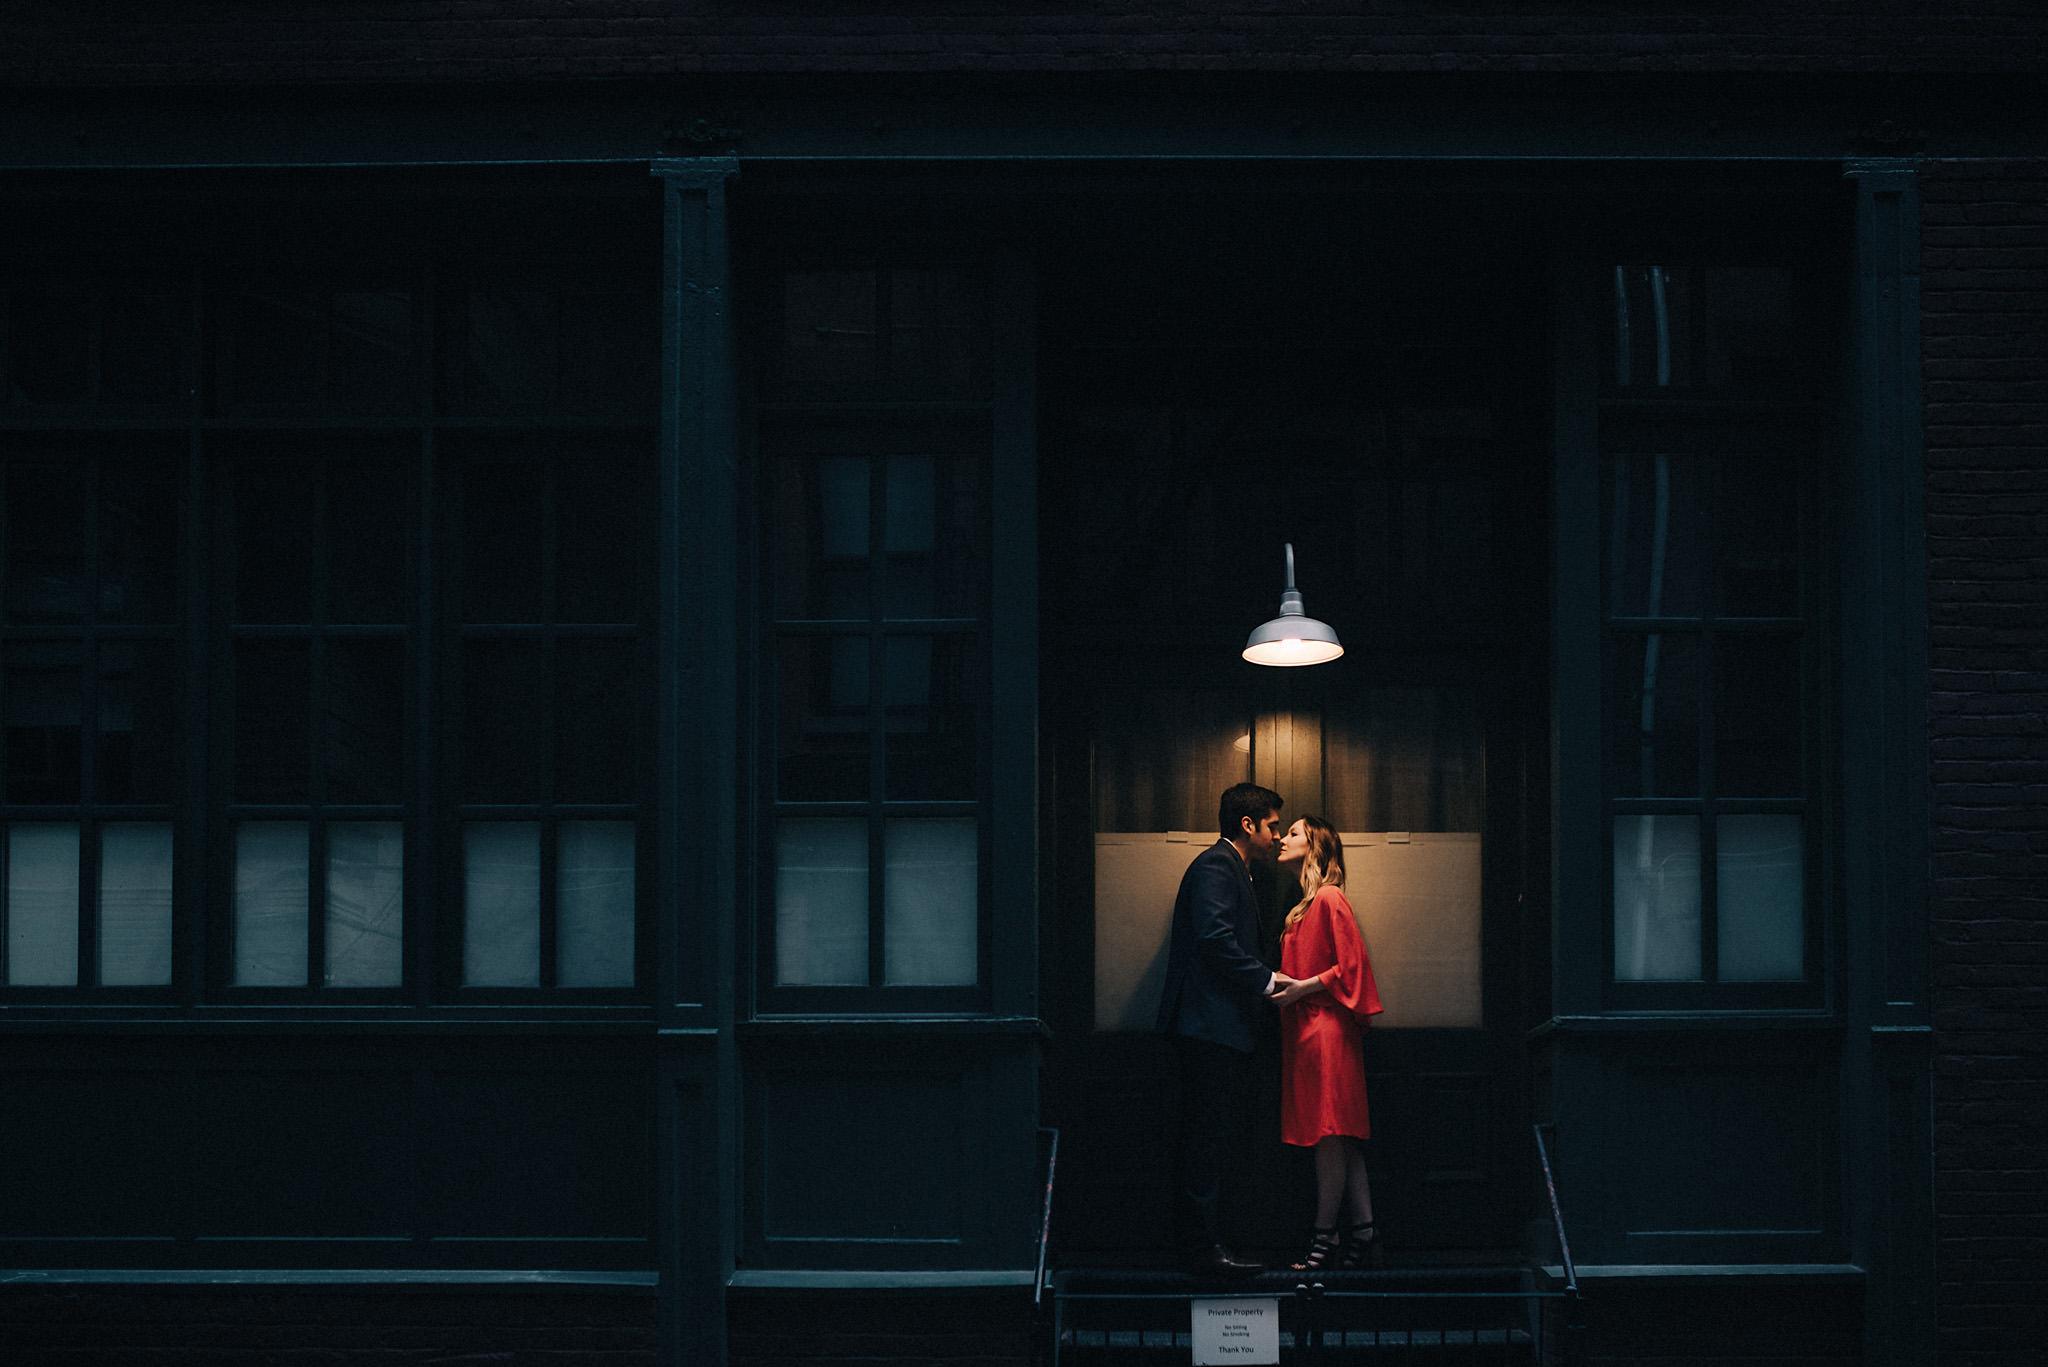 New-York-Photographer-Engagement-Felipe-Carranza-25